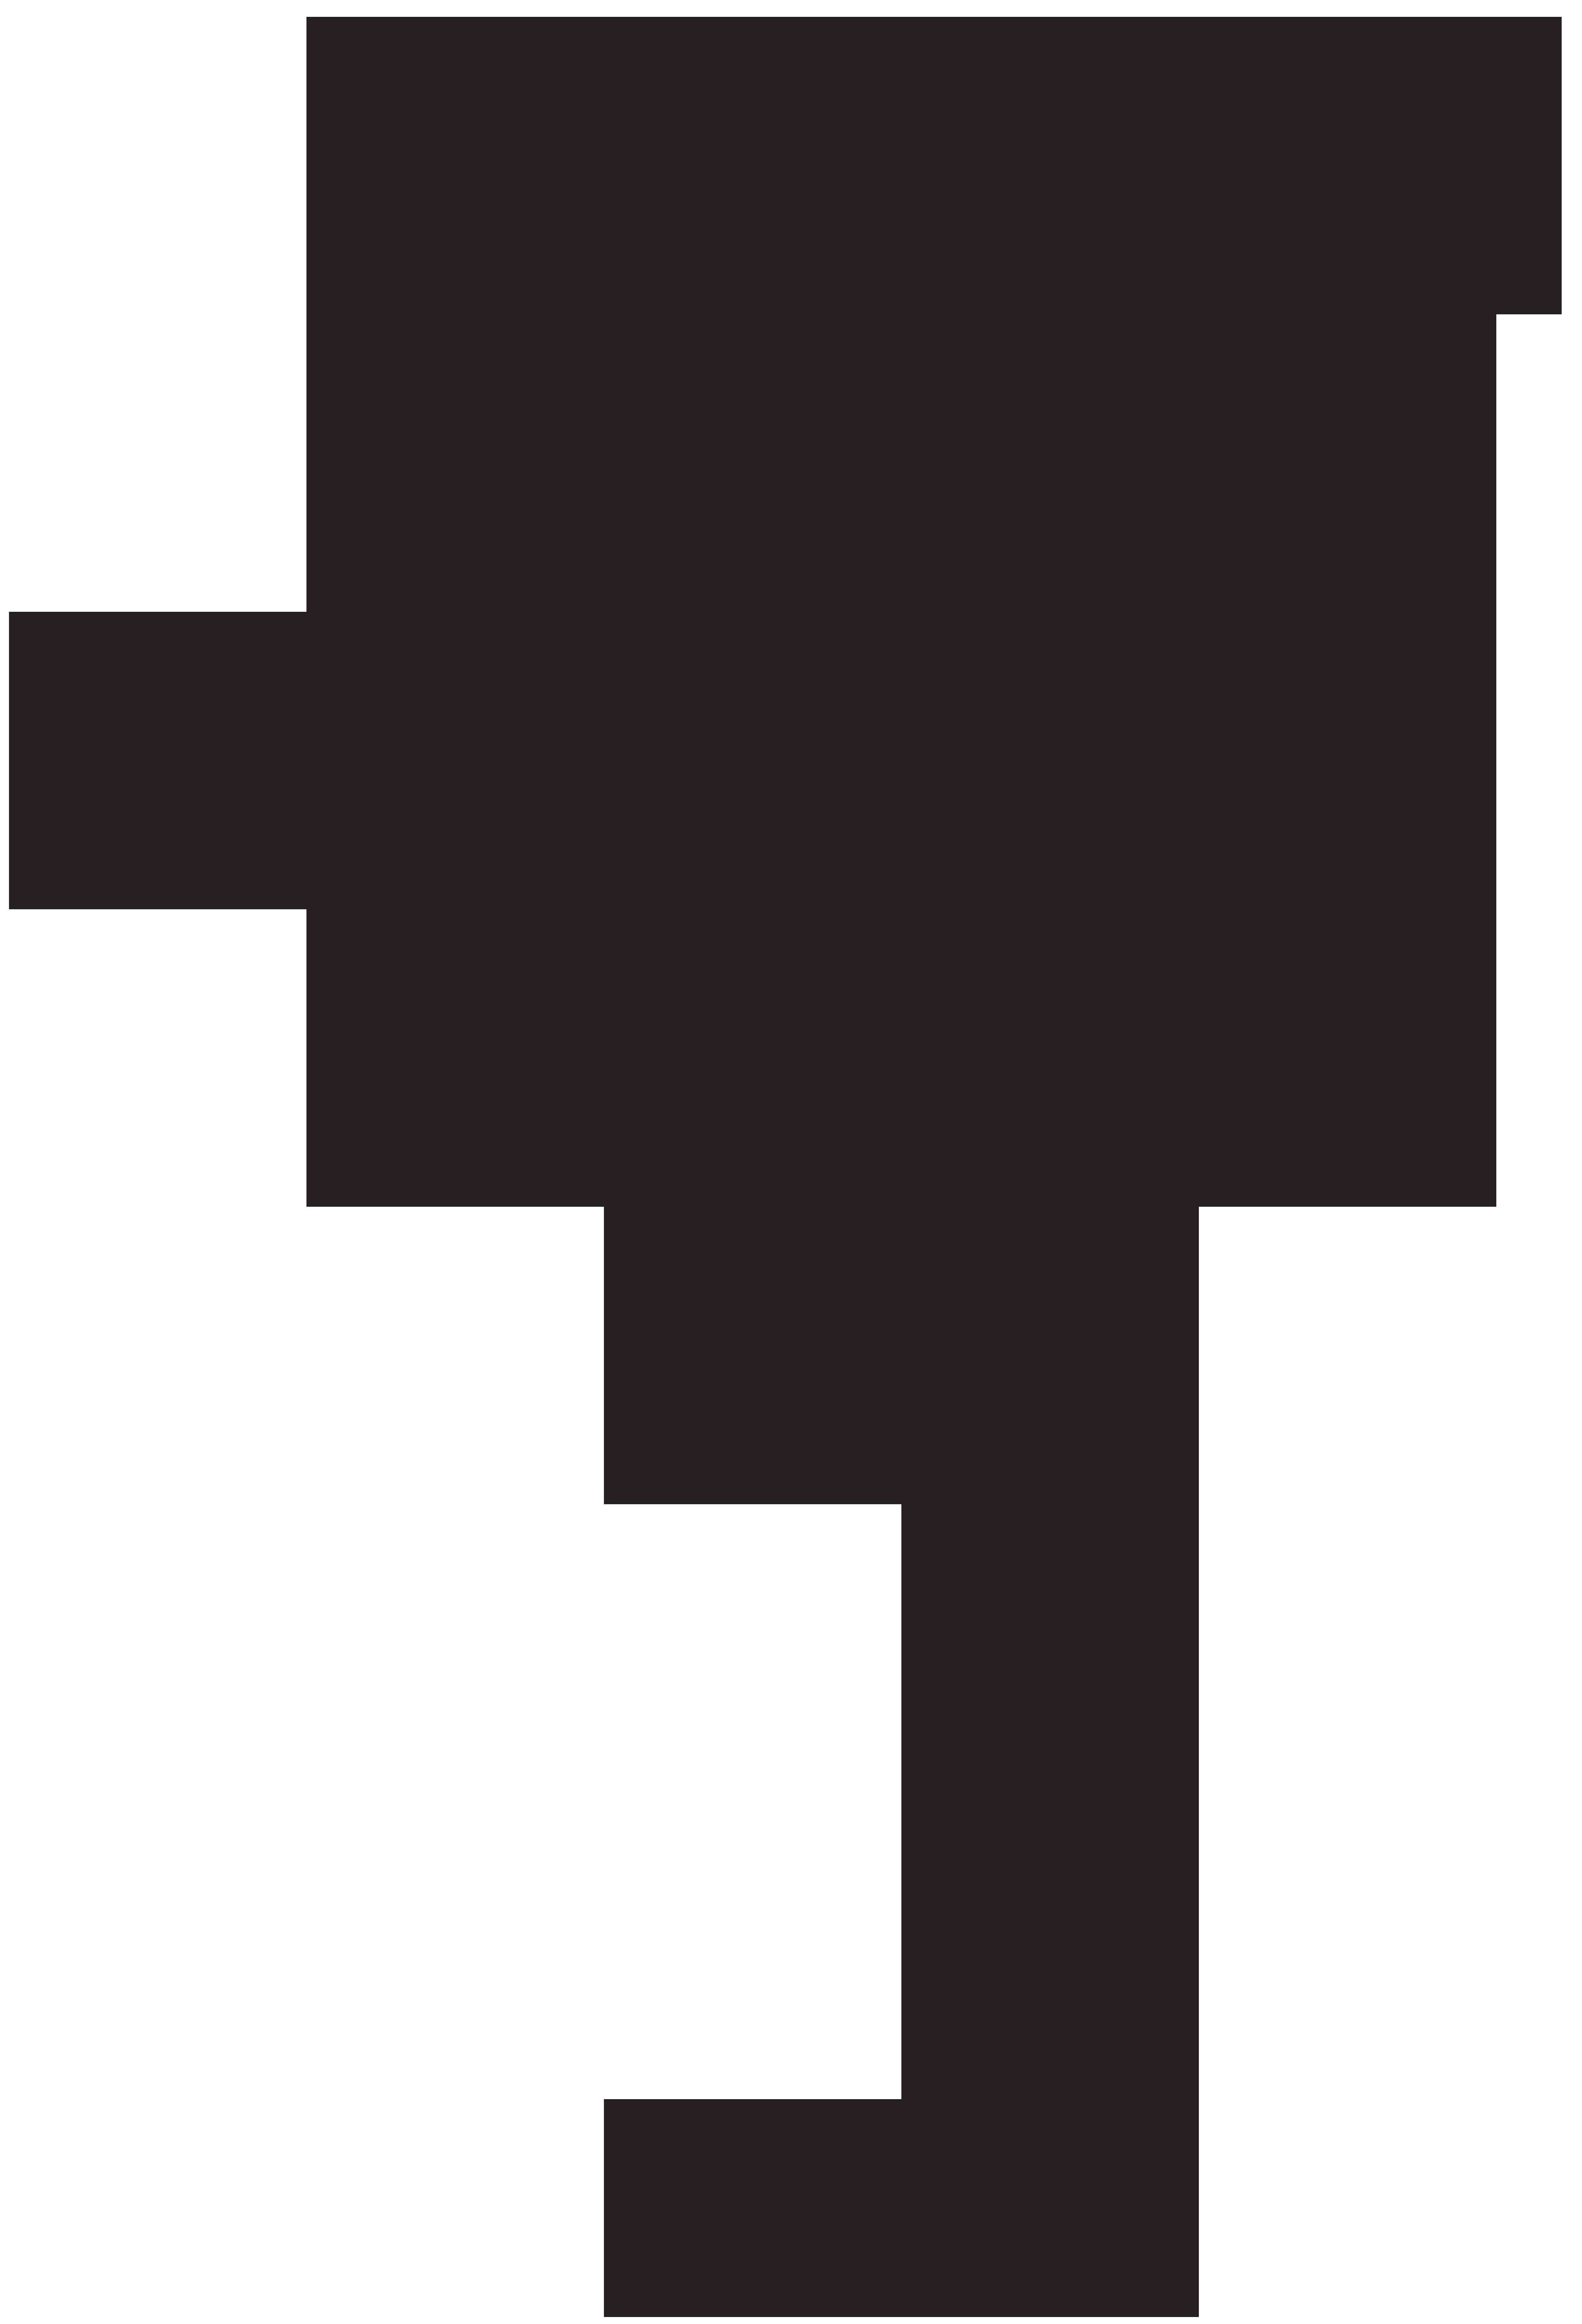 5446x8000 Figure Skating Woman Silhouette Png Clip Artu200b Gallery